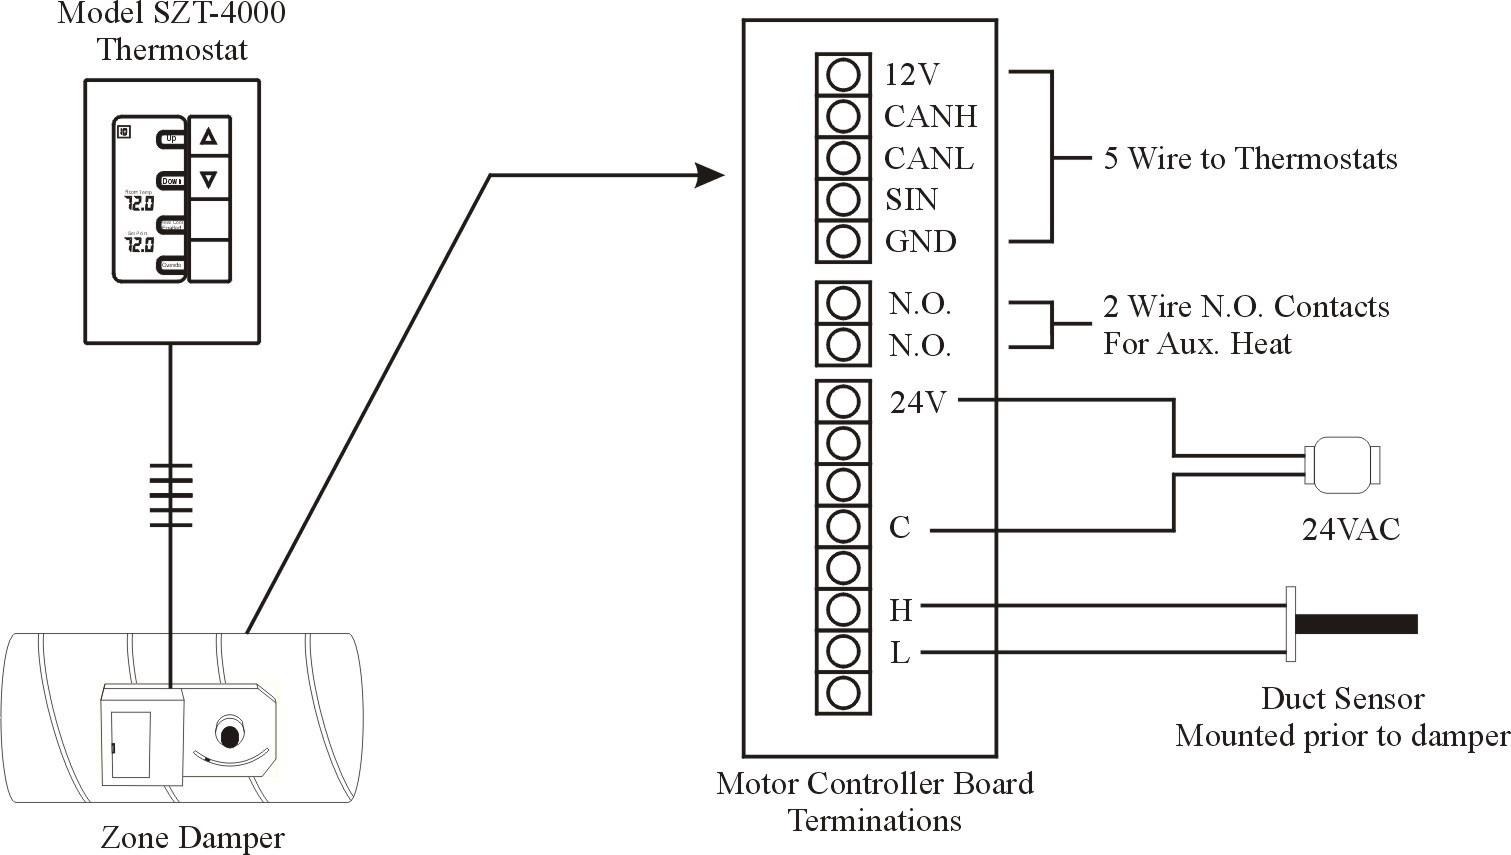 Duct Smoke Detector Wiring Diagram - Simple Wiring Diagram - 2 Wire Smoke Detector Wiring Diagram